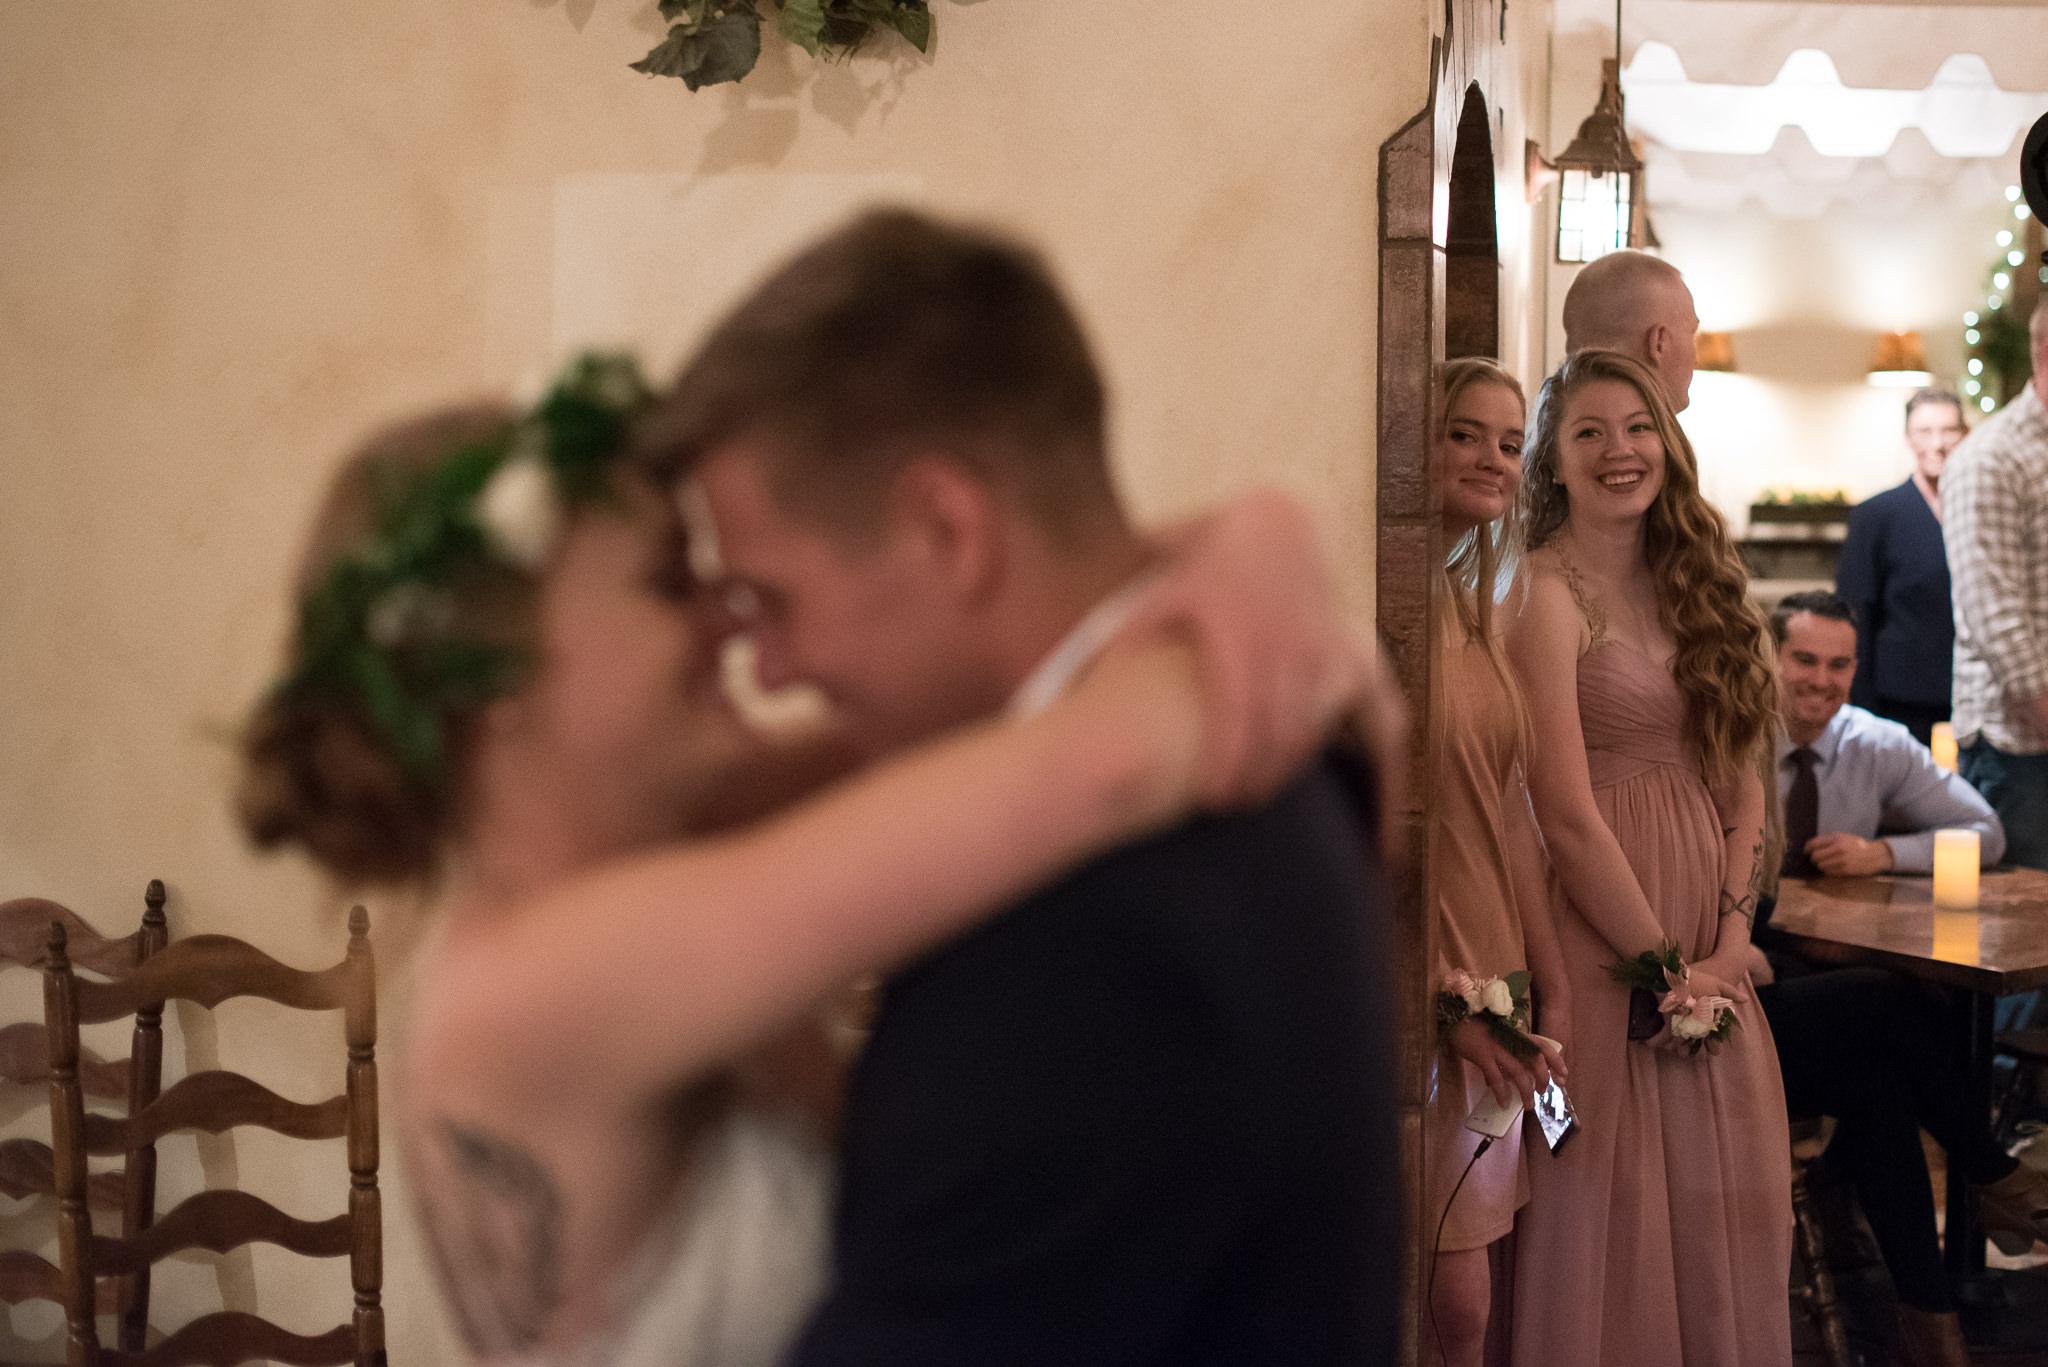 Trevor-Hooper-Wedding-Photographer-The-Bungalow-Wedding-Utah_CLR_067.jpg